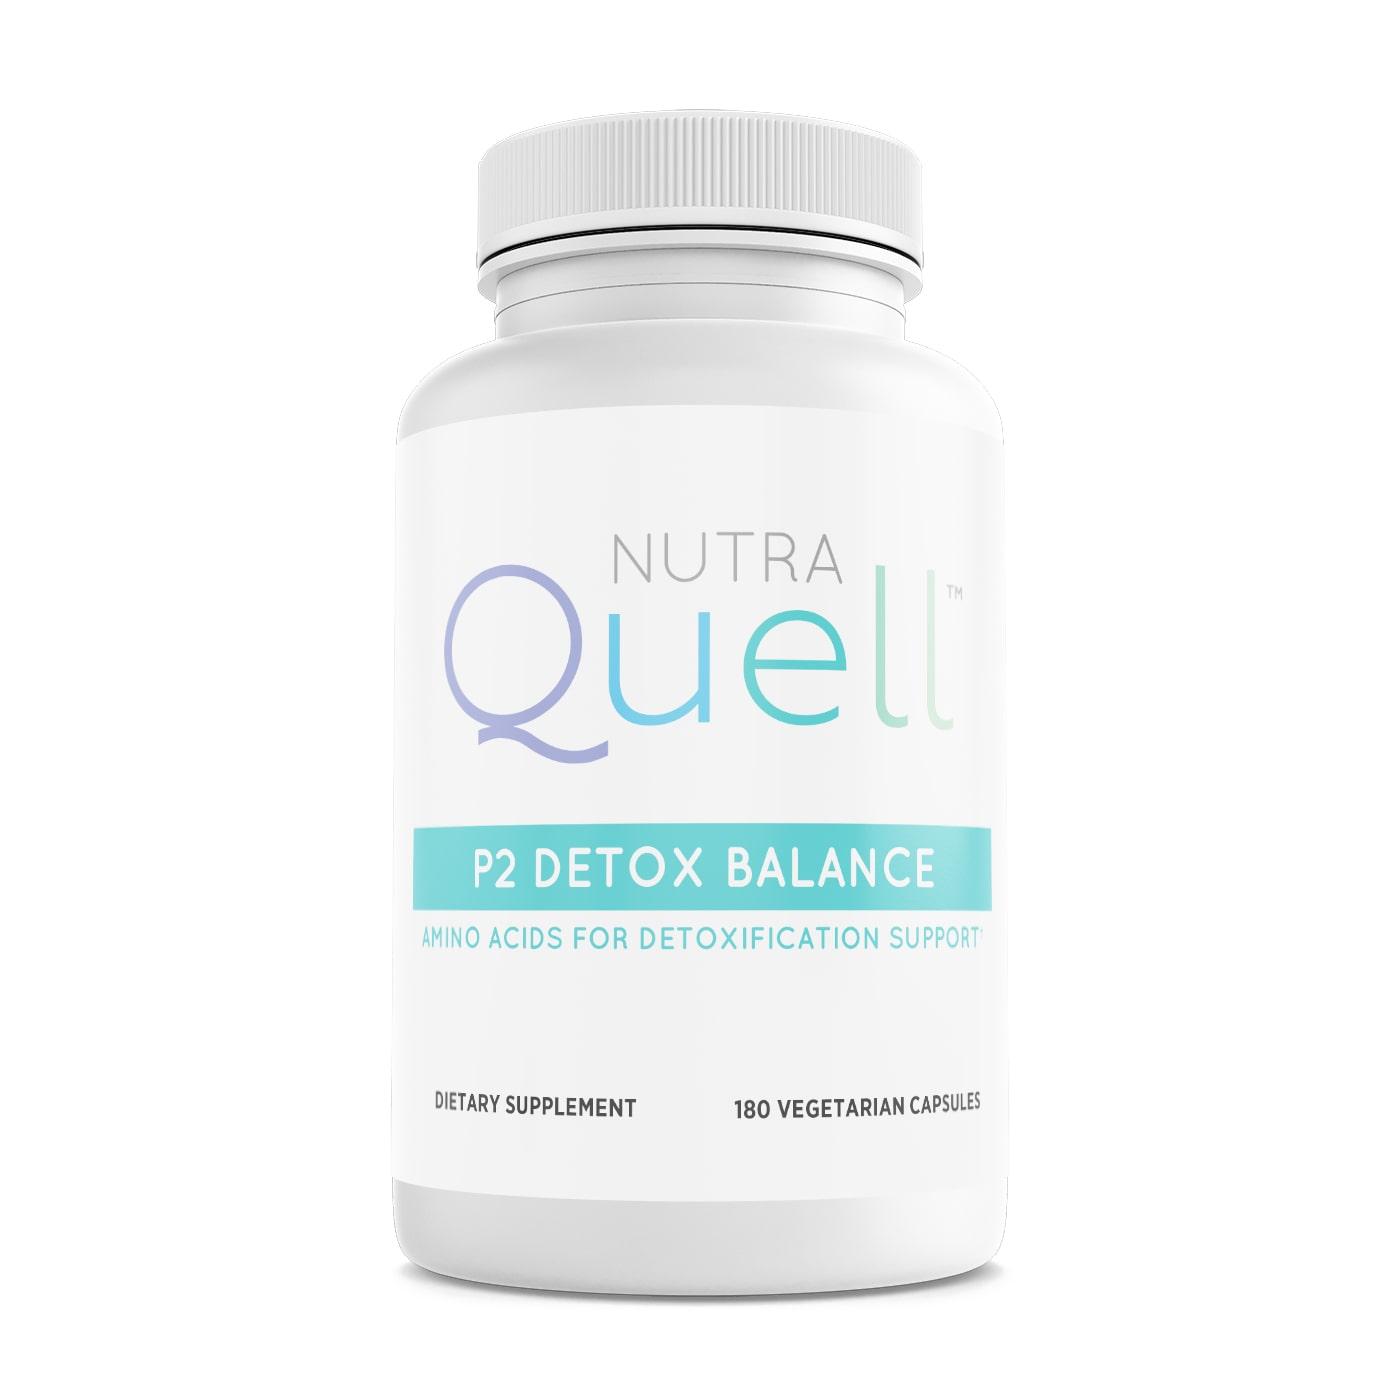 P2 Detox Balance